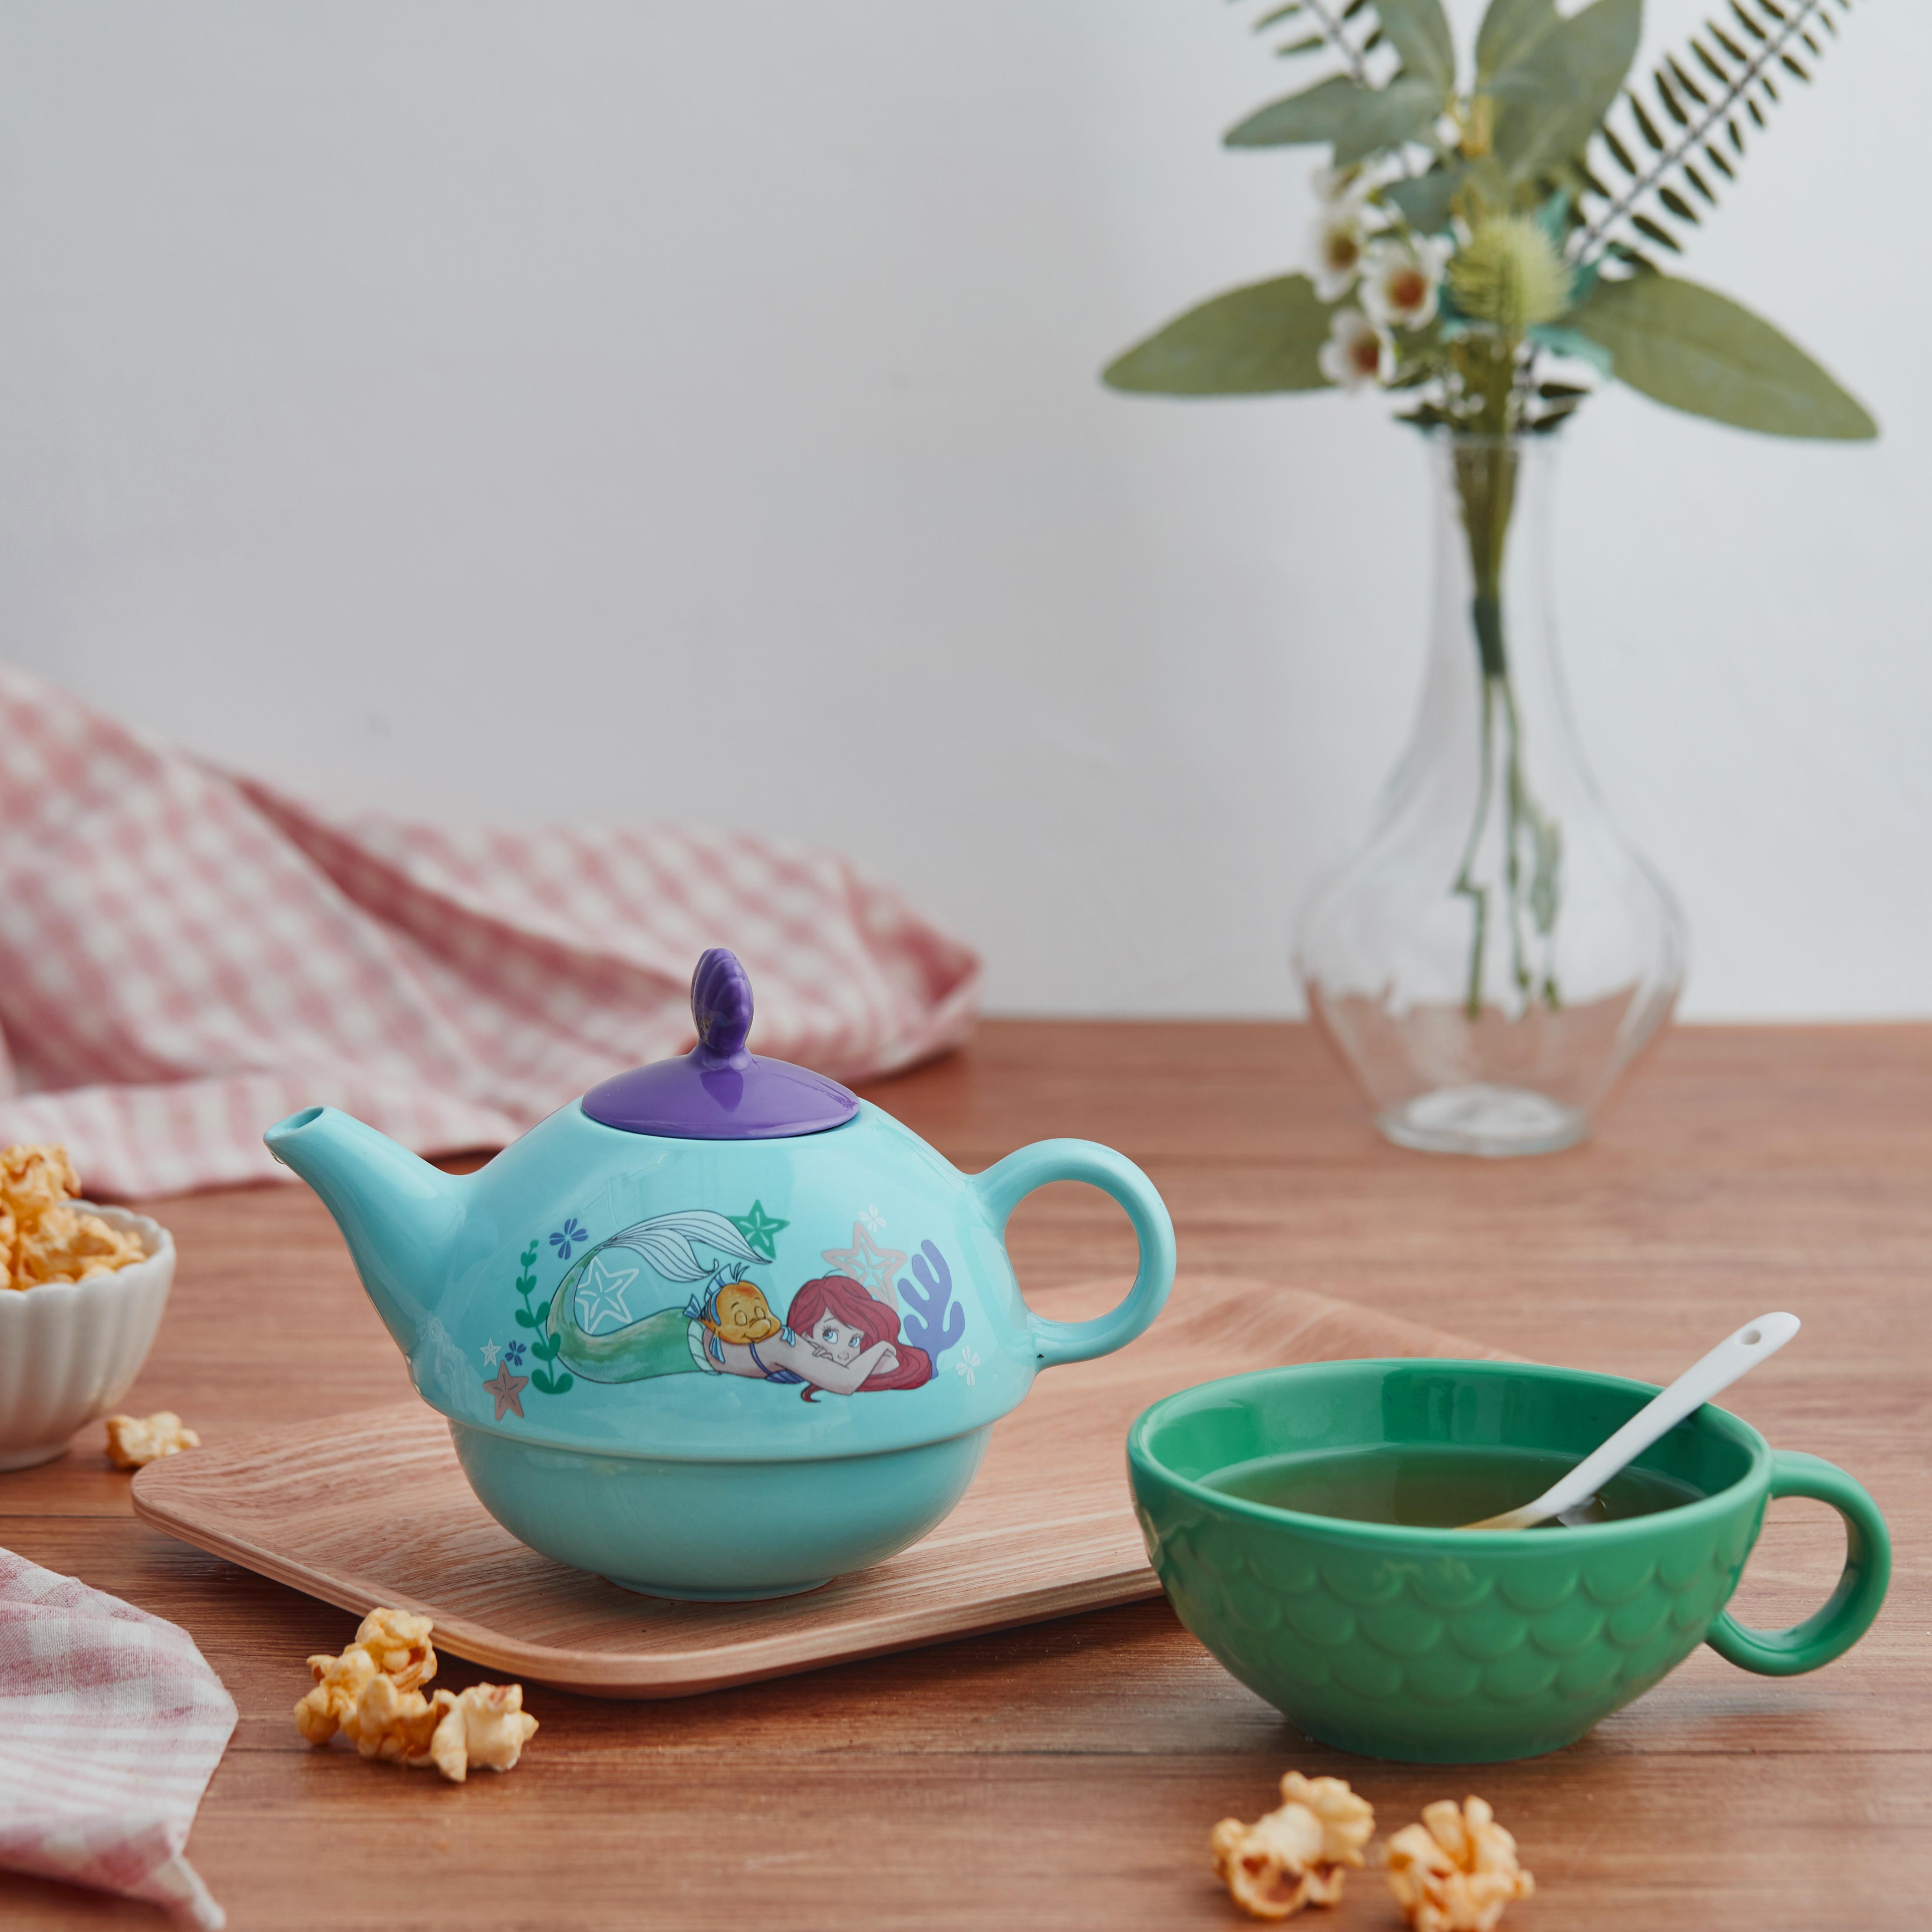 Disney The Little Mermaid Sculpted Ceramic Tea Set, Princess Ariel, 4-piece set slideshow image 6